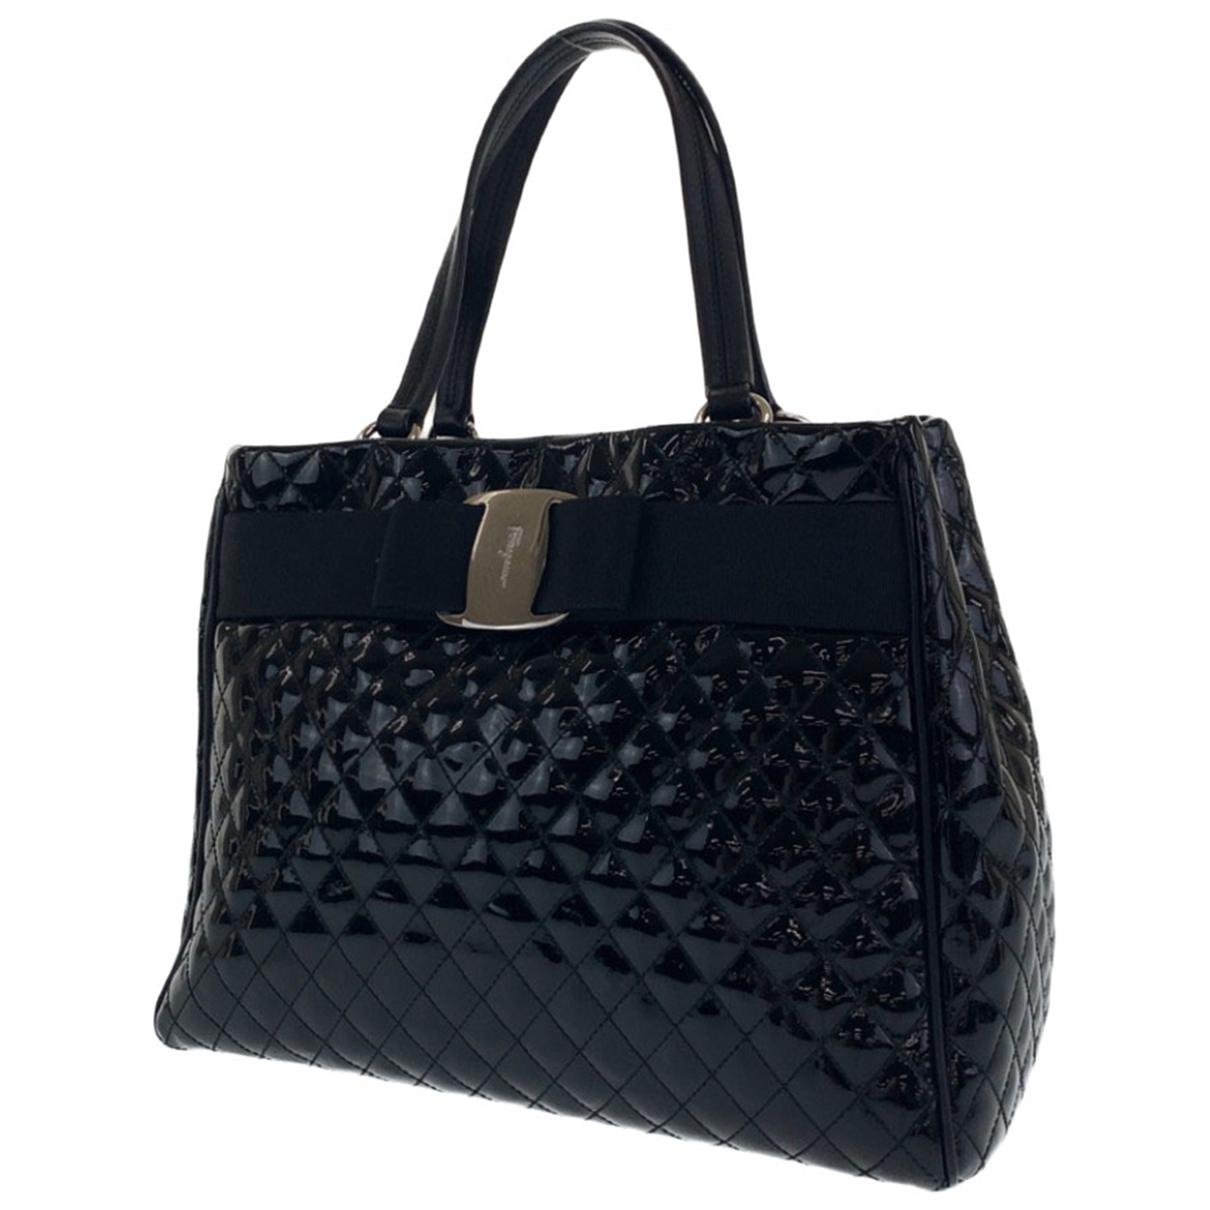 Salvatore Ferragamo \N handbag for Women \N